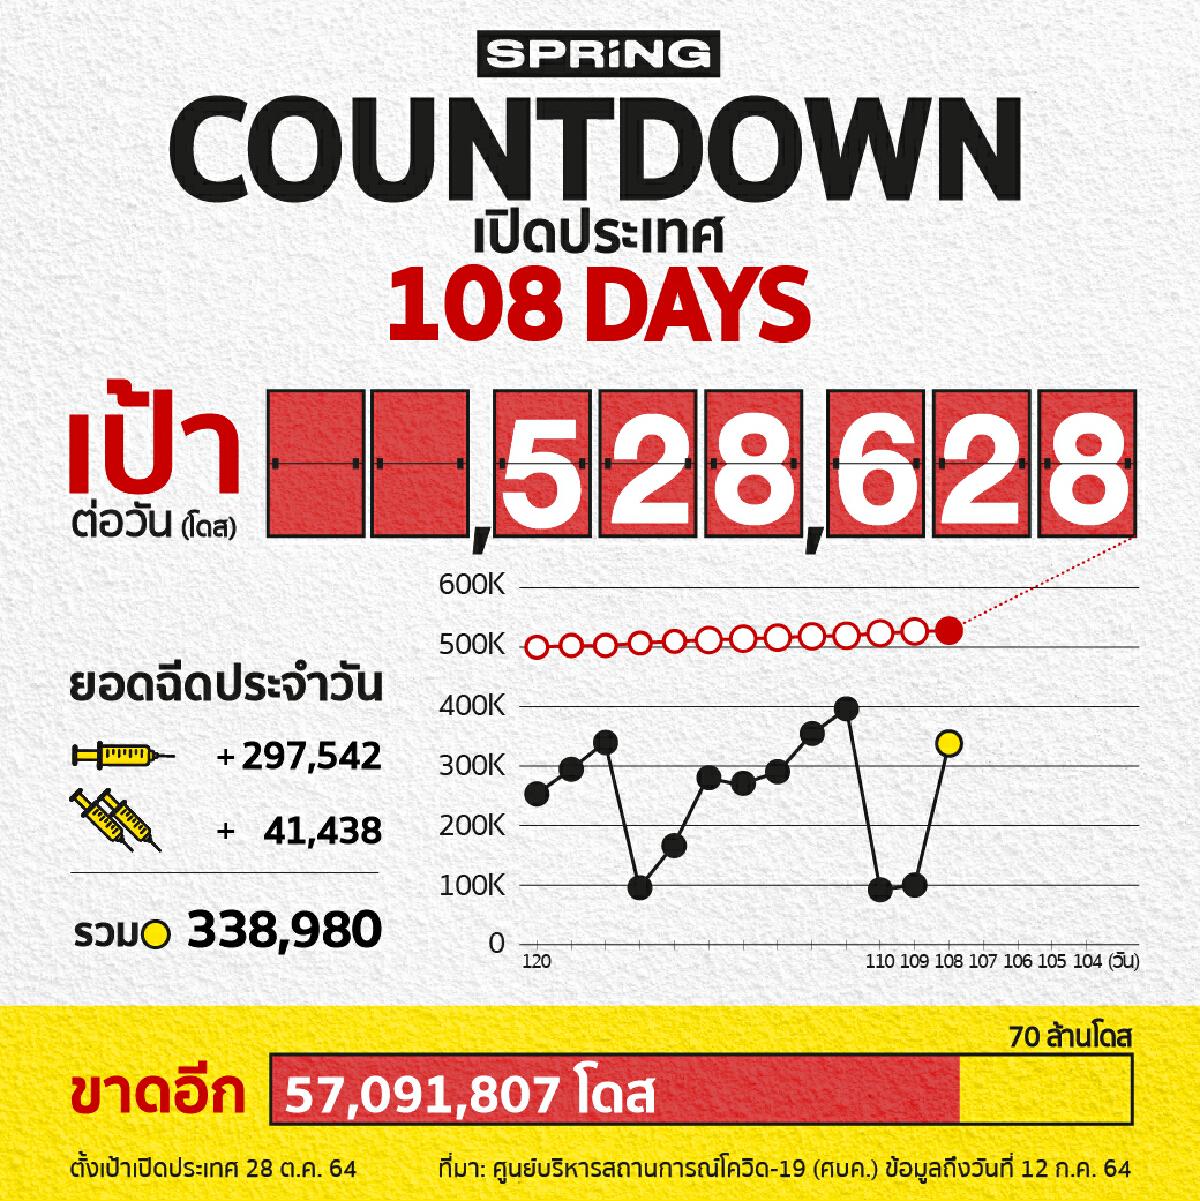 COUNTDOWN! เปิดประเทศใน 108 วัน ฉีดวัคซีนได้ 338,980 โดส